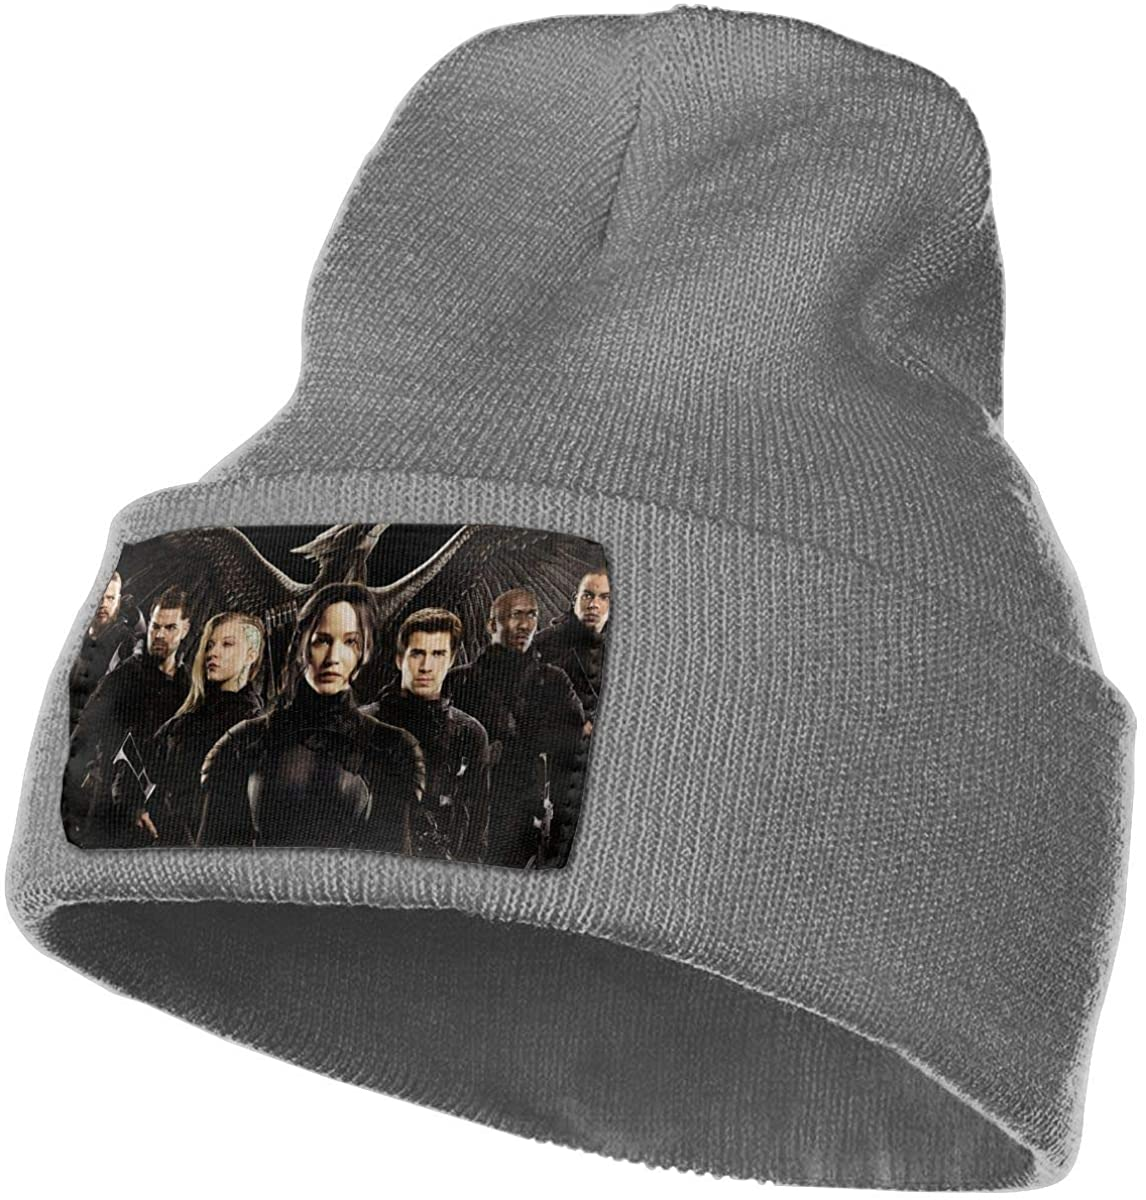 The Hun-ger Games Unisex Fall Winter Warm Knit Cap Beanie Hat Stretchy Ski Cap, 18x30 cm Deep Heather